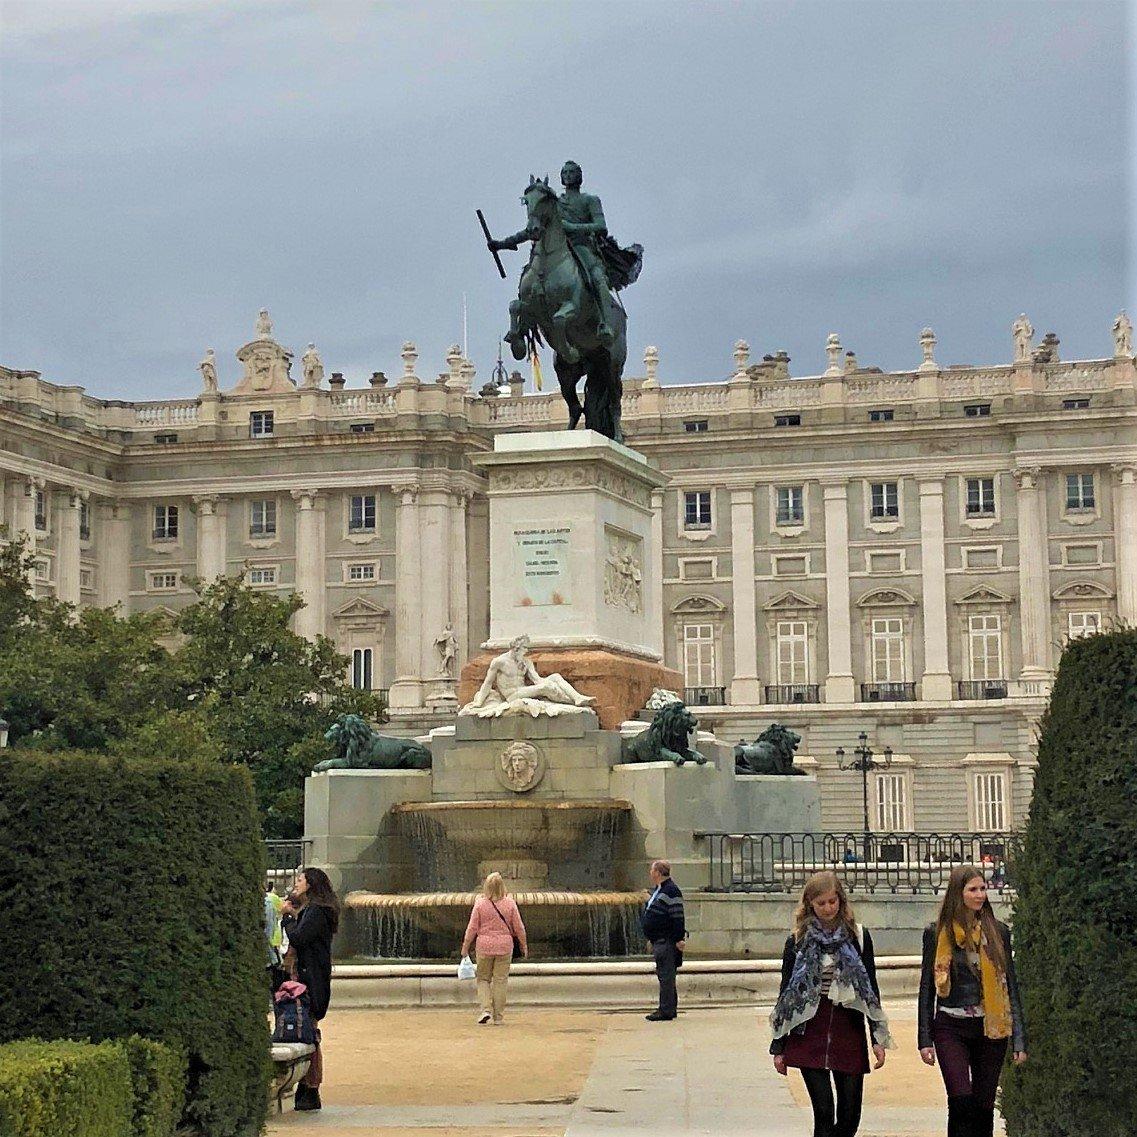 The Madrid Palace